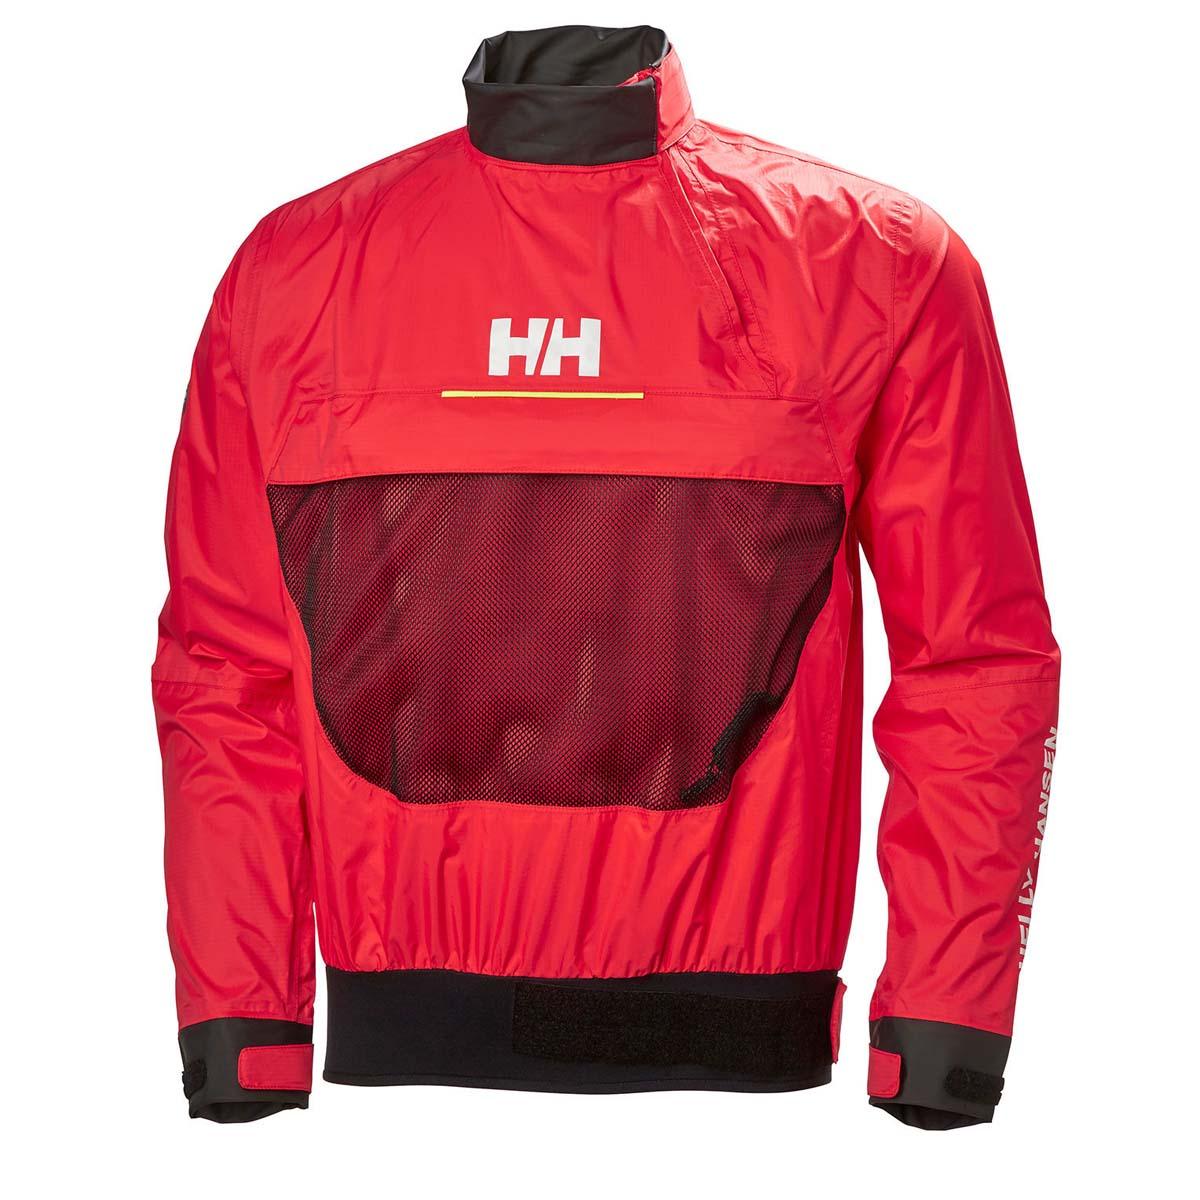 Helly Hansen HP Smock Top (33913)